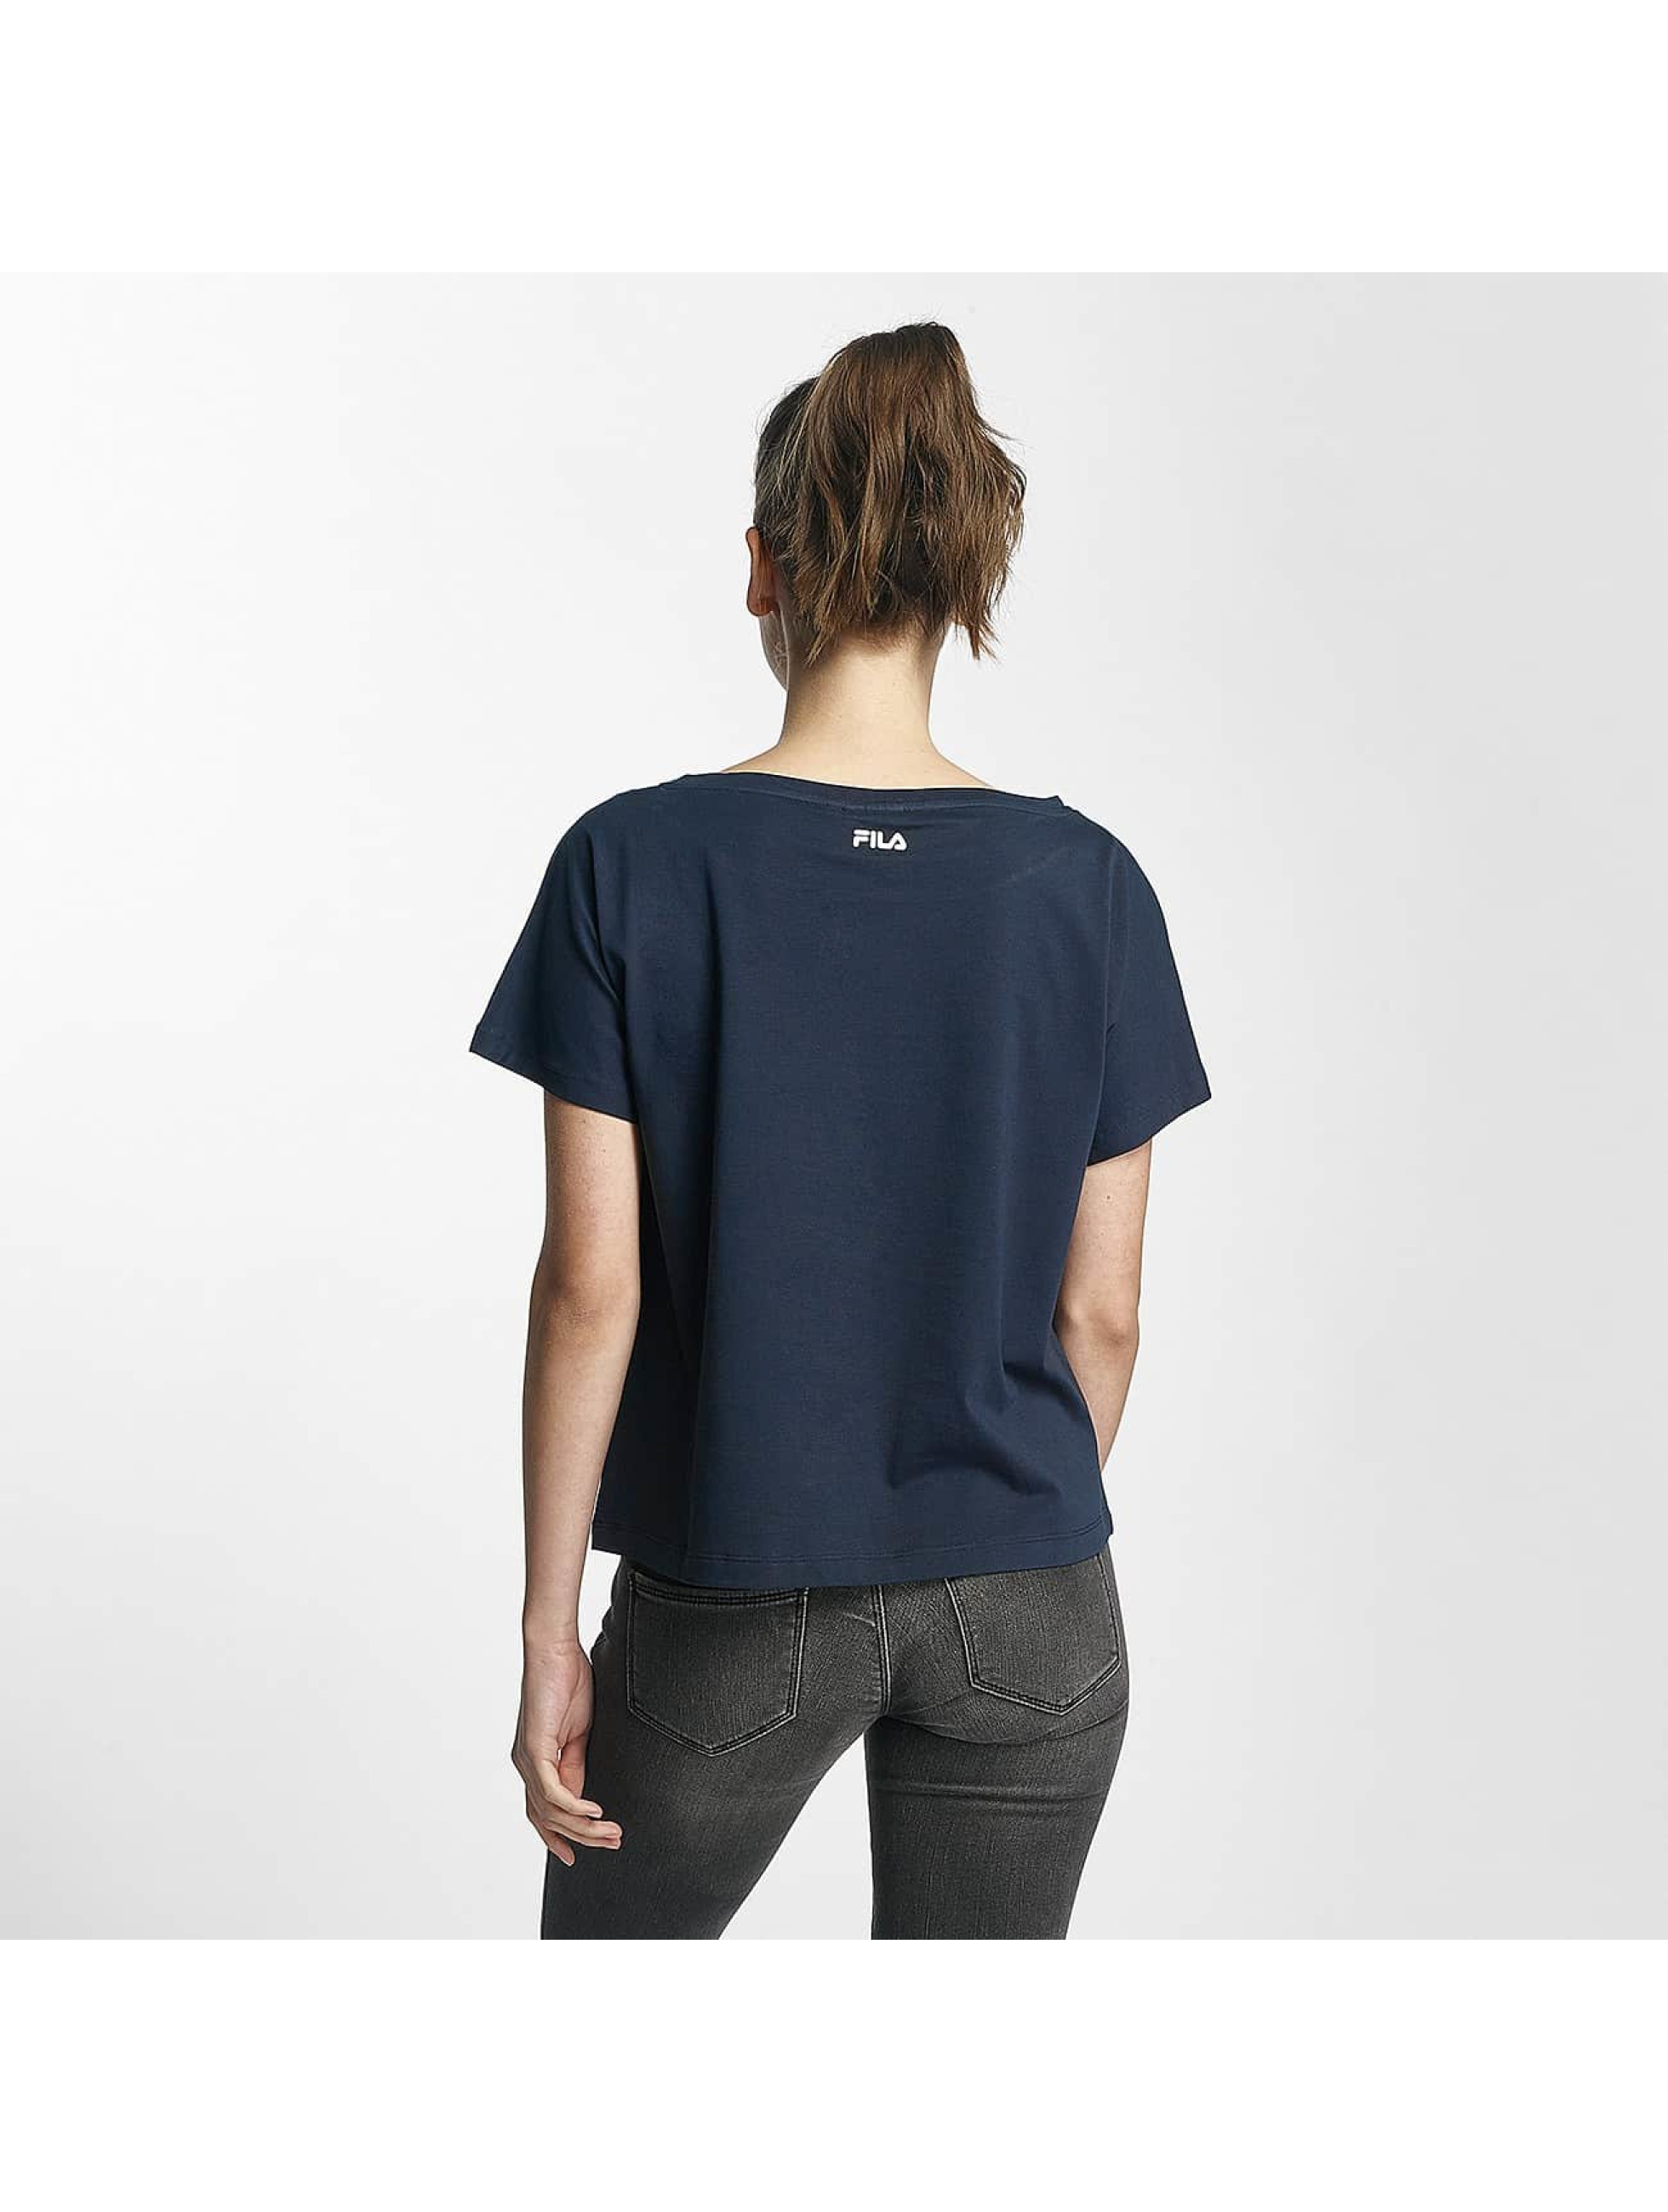 FILA T-Shirt Core Line blau